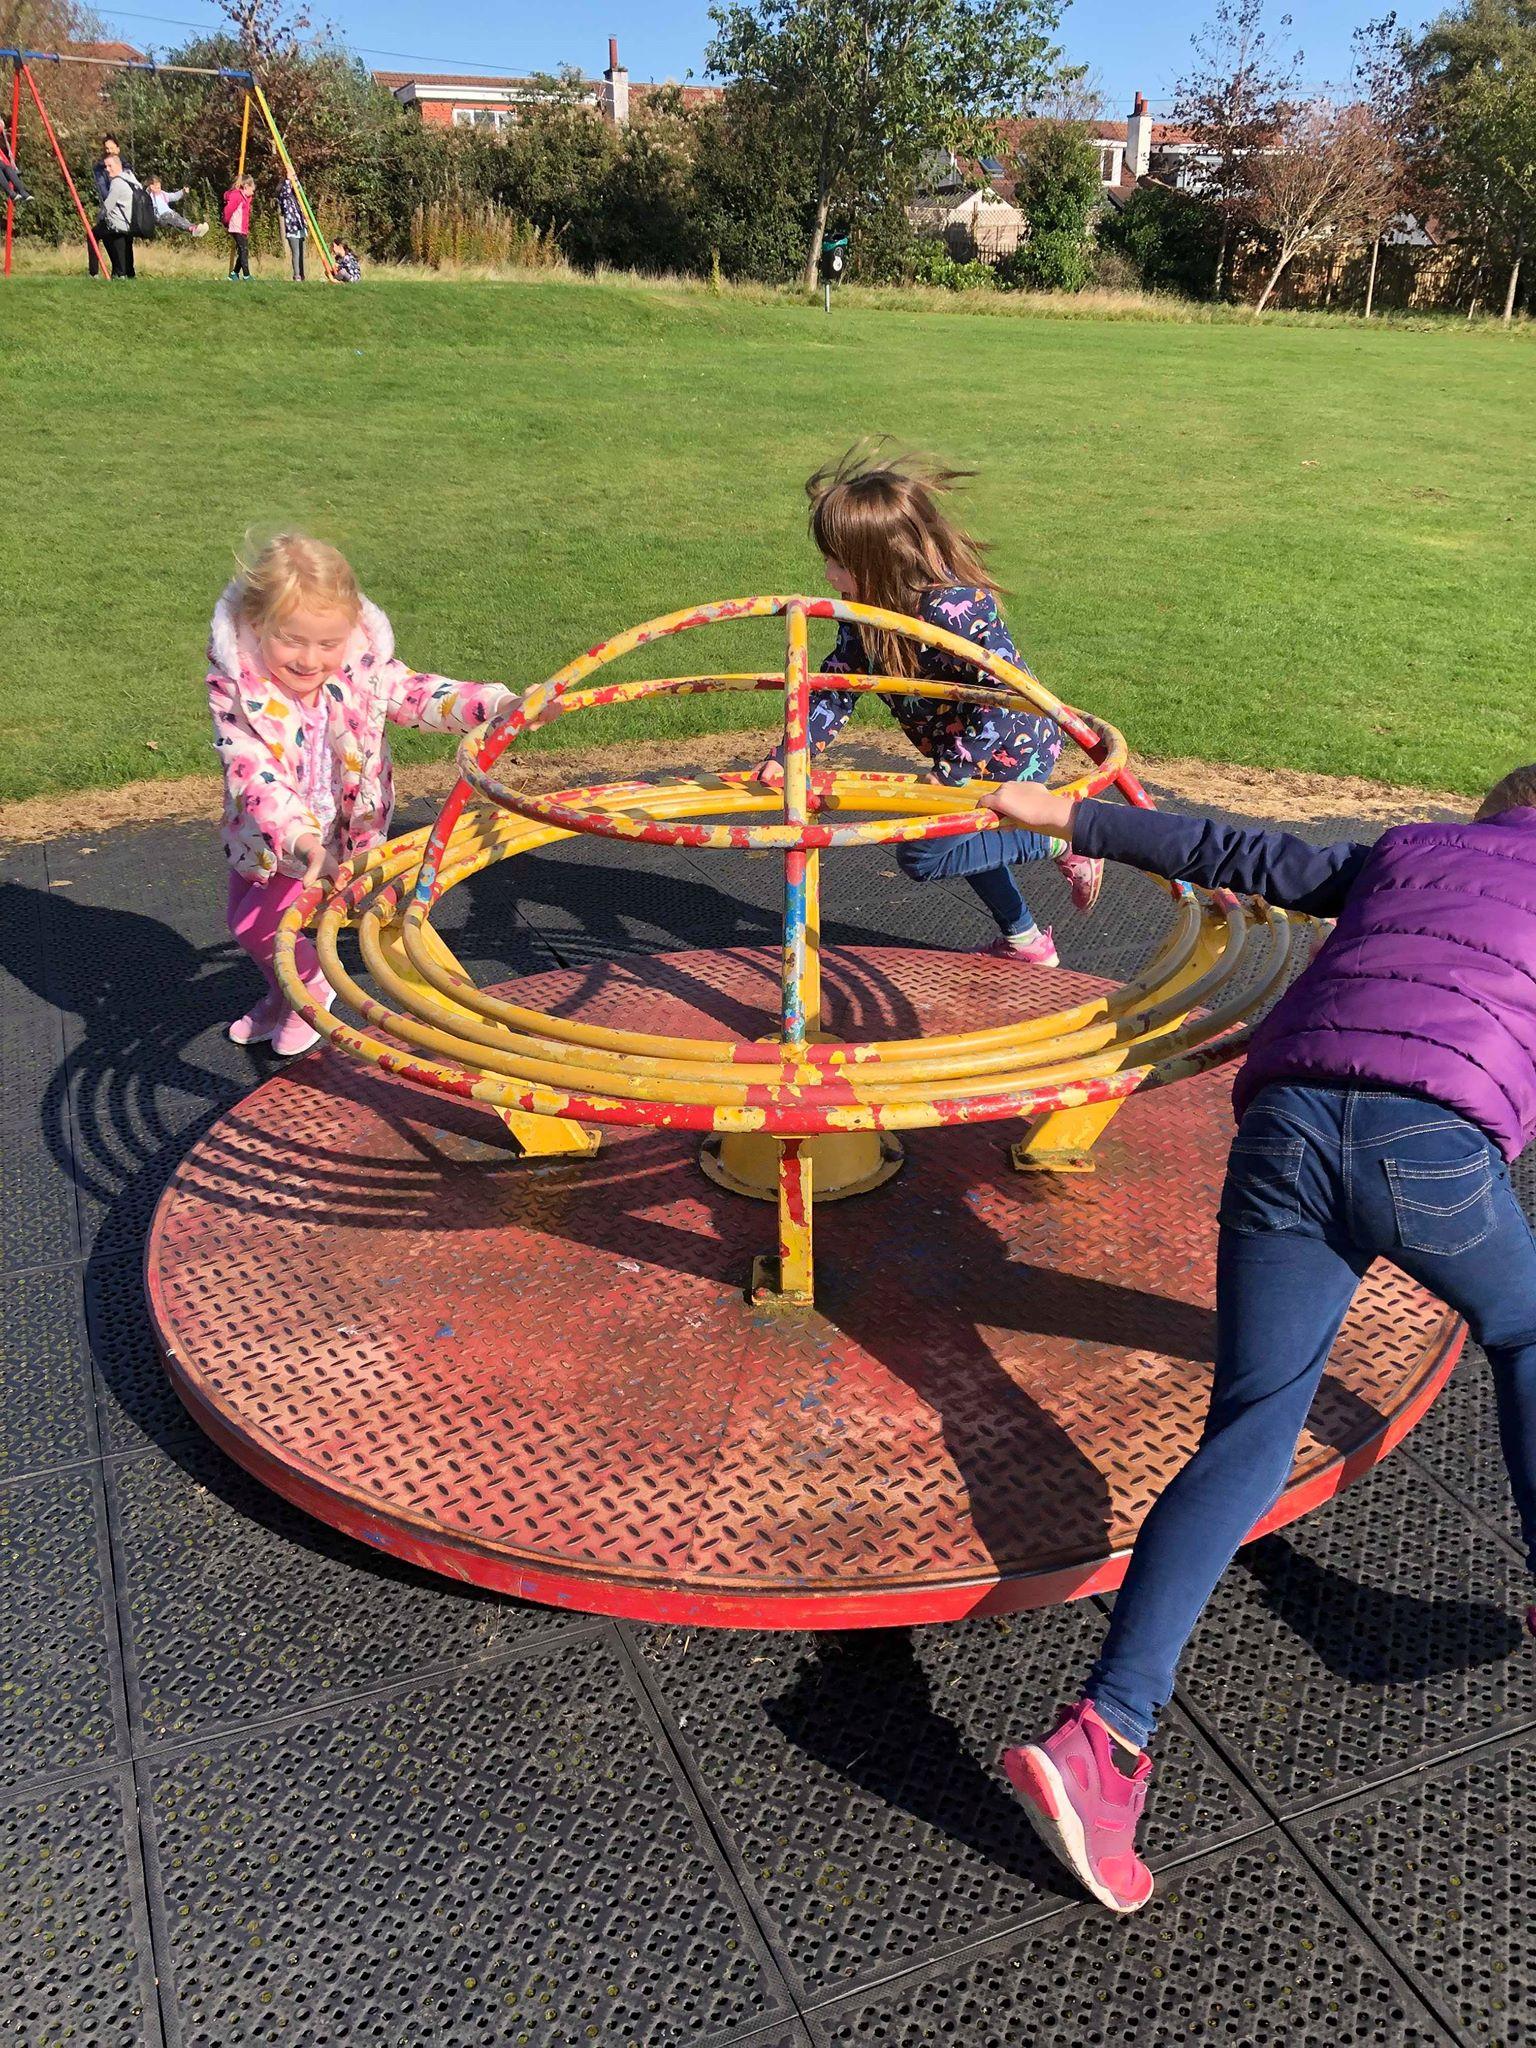 OSC - Girls on roundabout